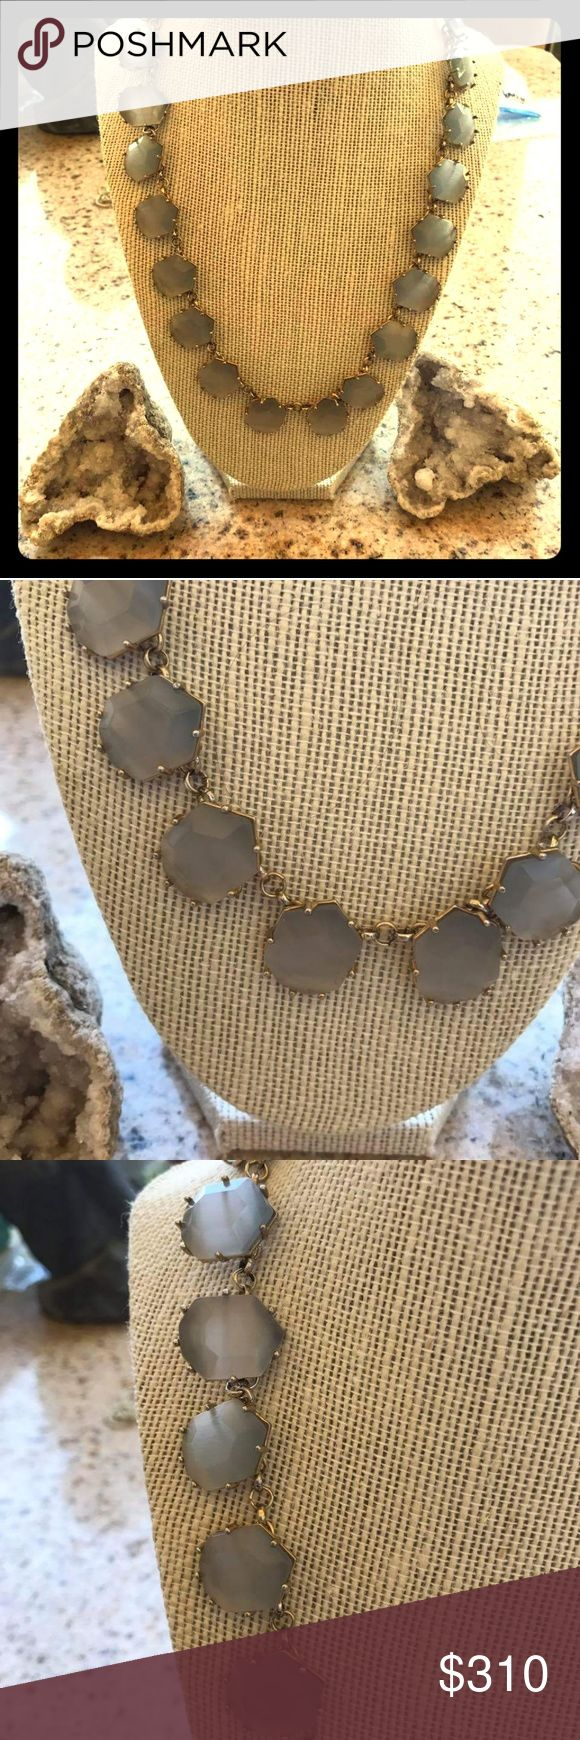 Kendra Scott Slate Sam Necklace Excellent condition Karen Scott Jewelry Necklaces